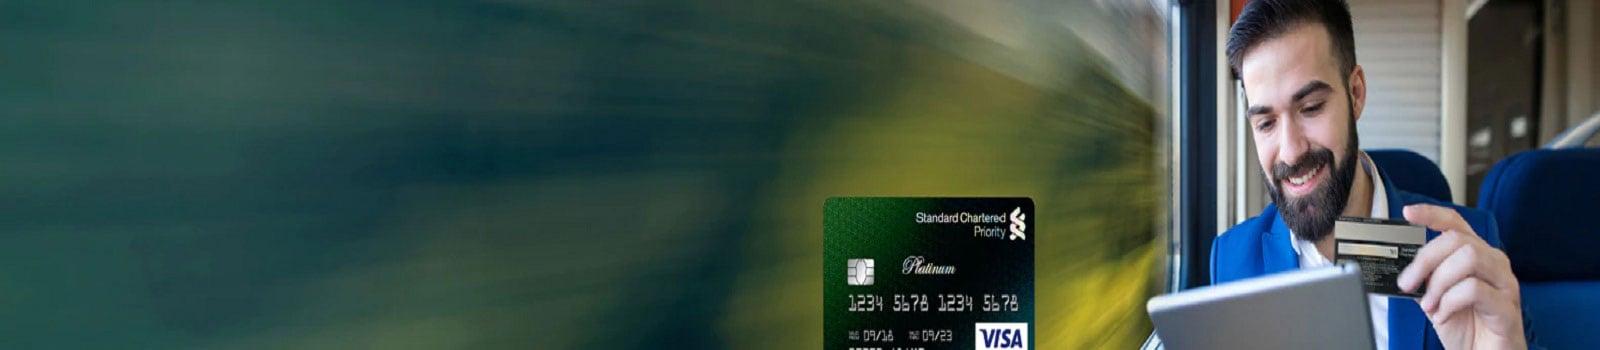 Priority Banking Debit Card